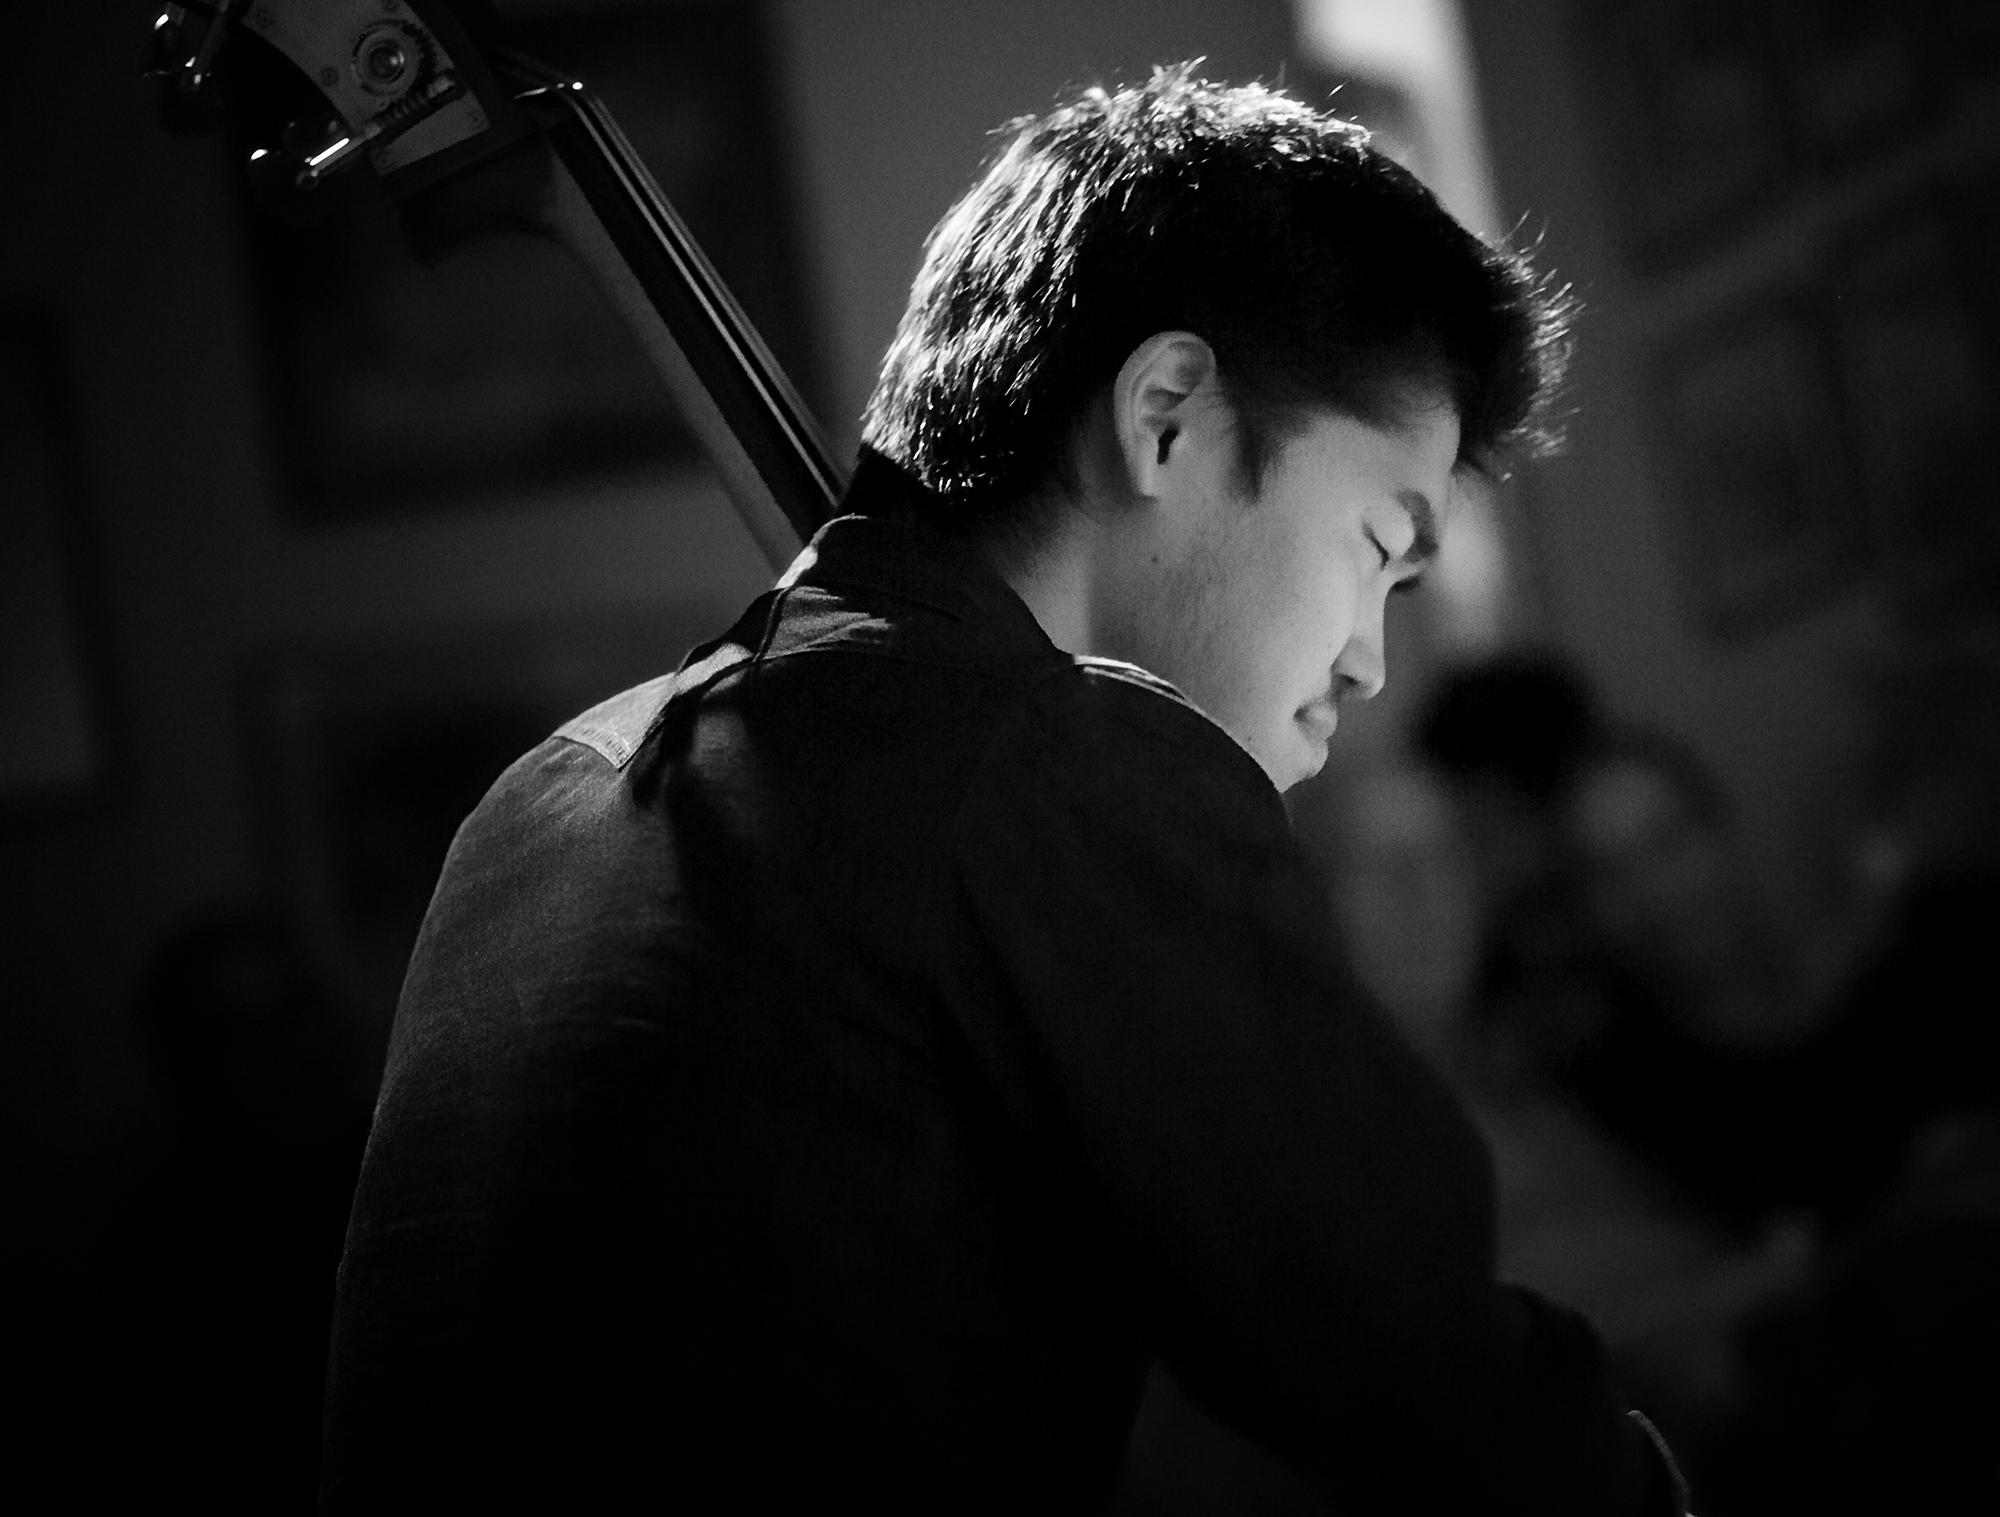 Shimpei Ogawa